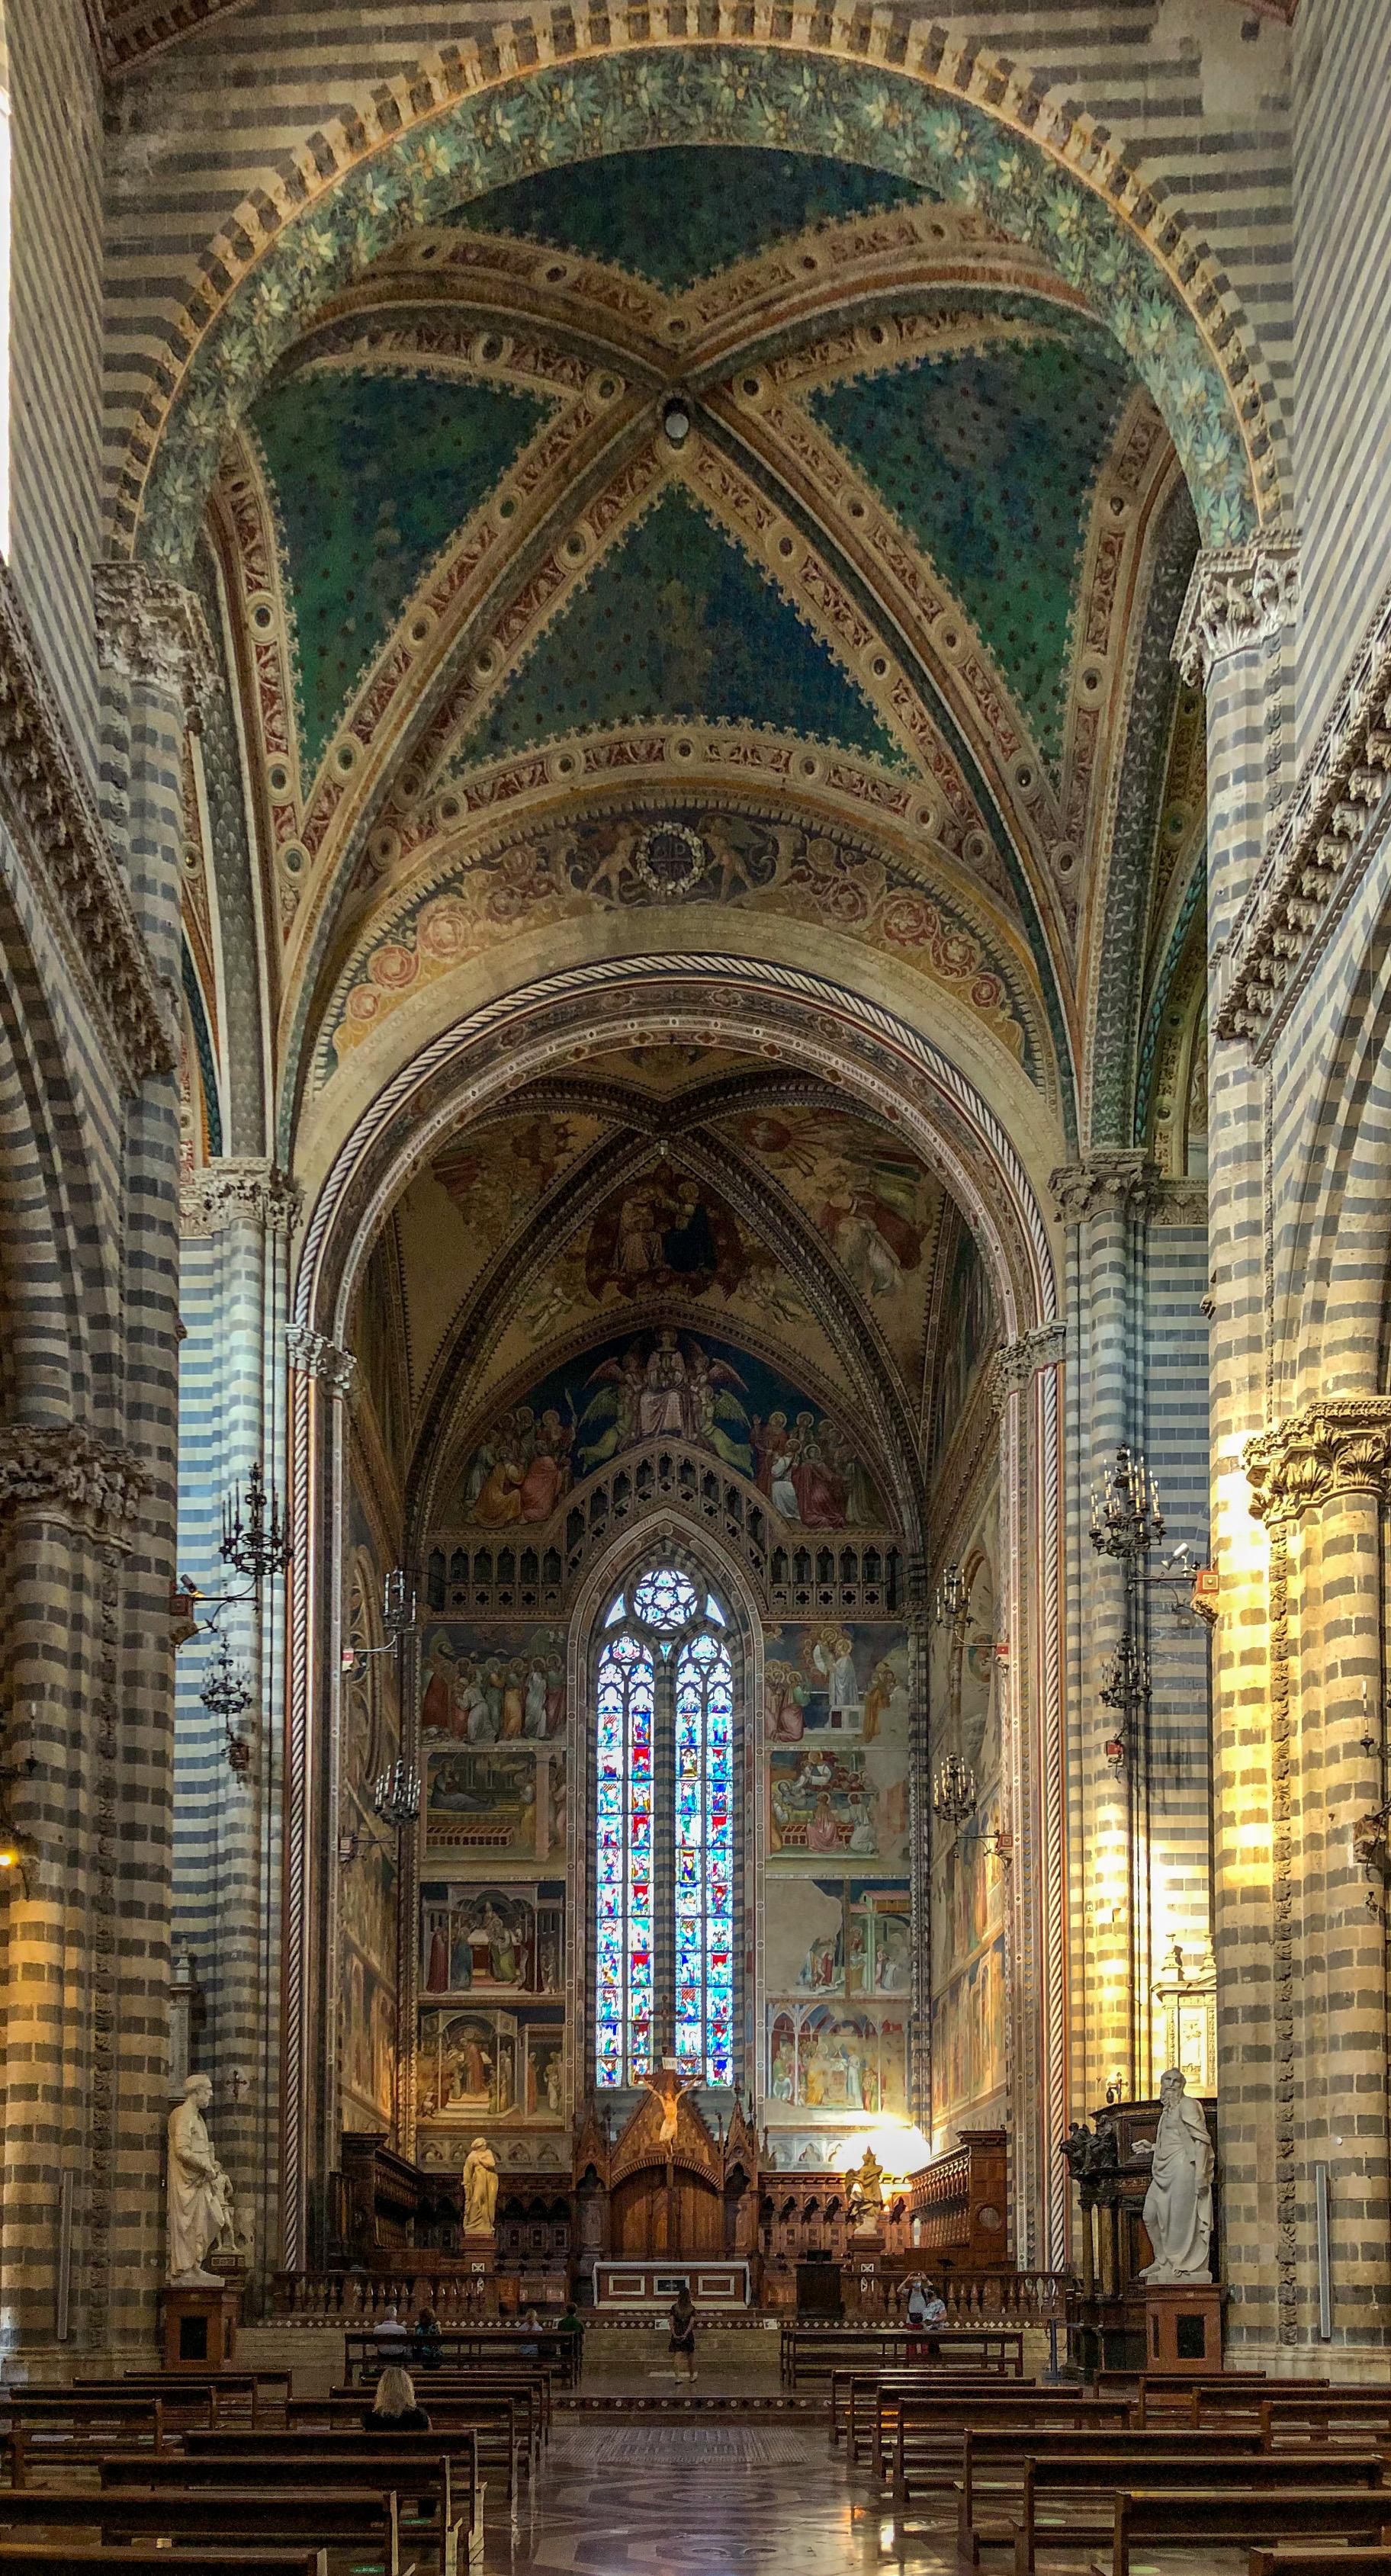 Italia - Italy - Casale Management - Travel - Orvieto - Duomo (interno) altare